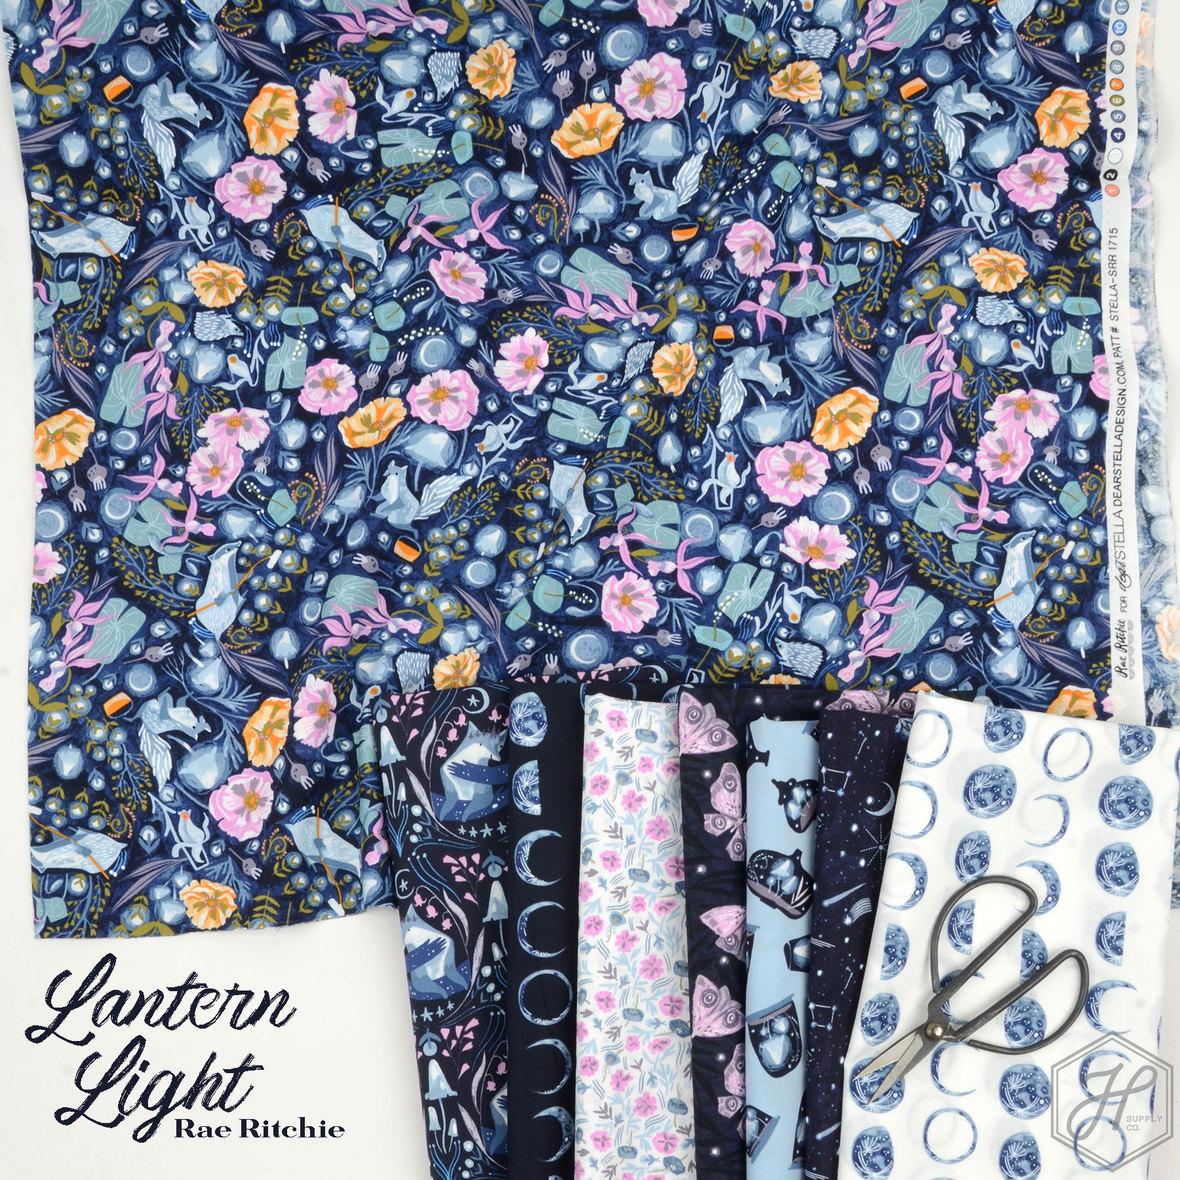 Lantern-Light-Fabric-Rae-Ritchie-for-Dear-Stella-at-Hawthrone-Supply-Co